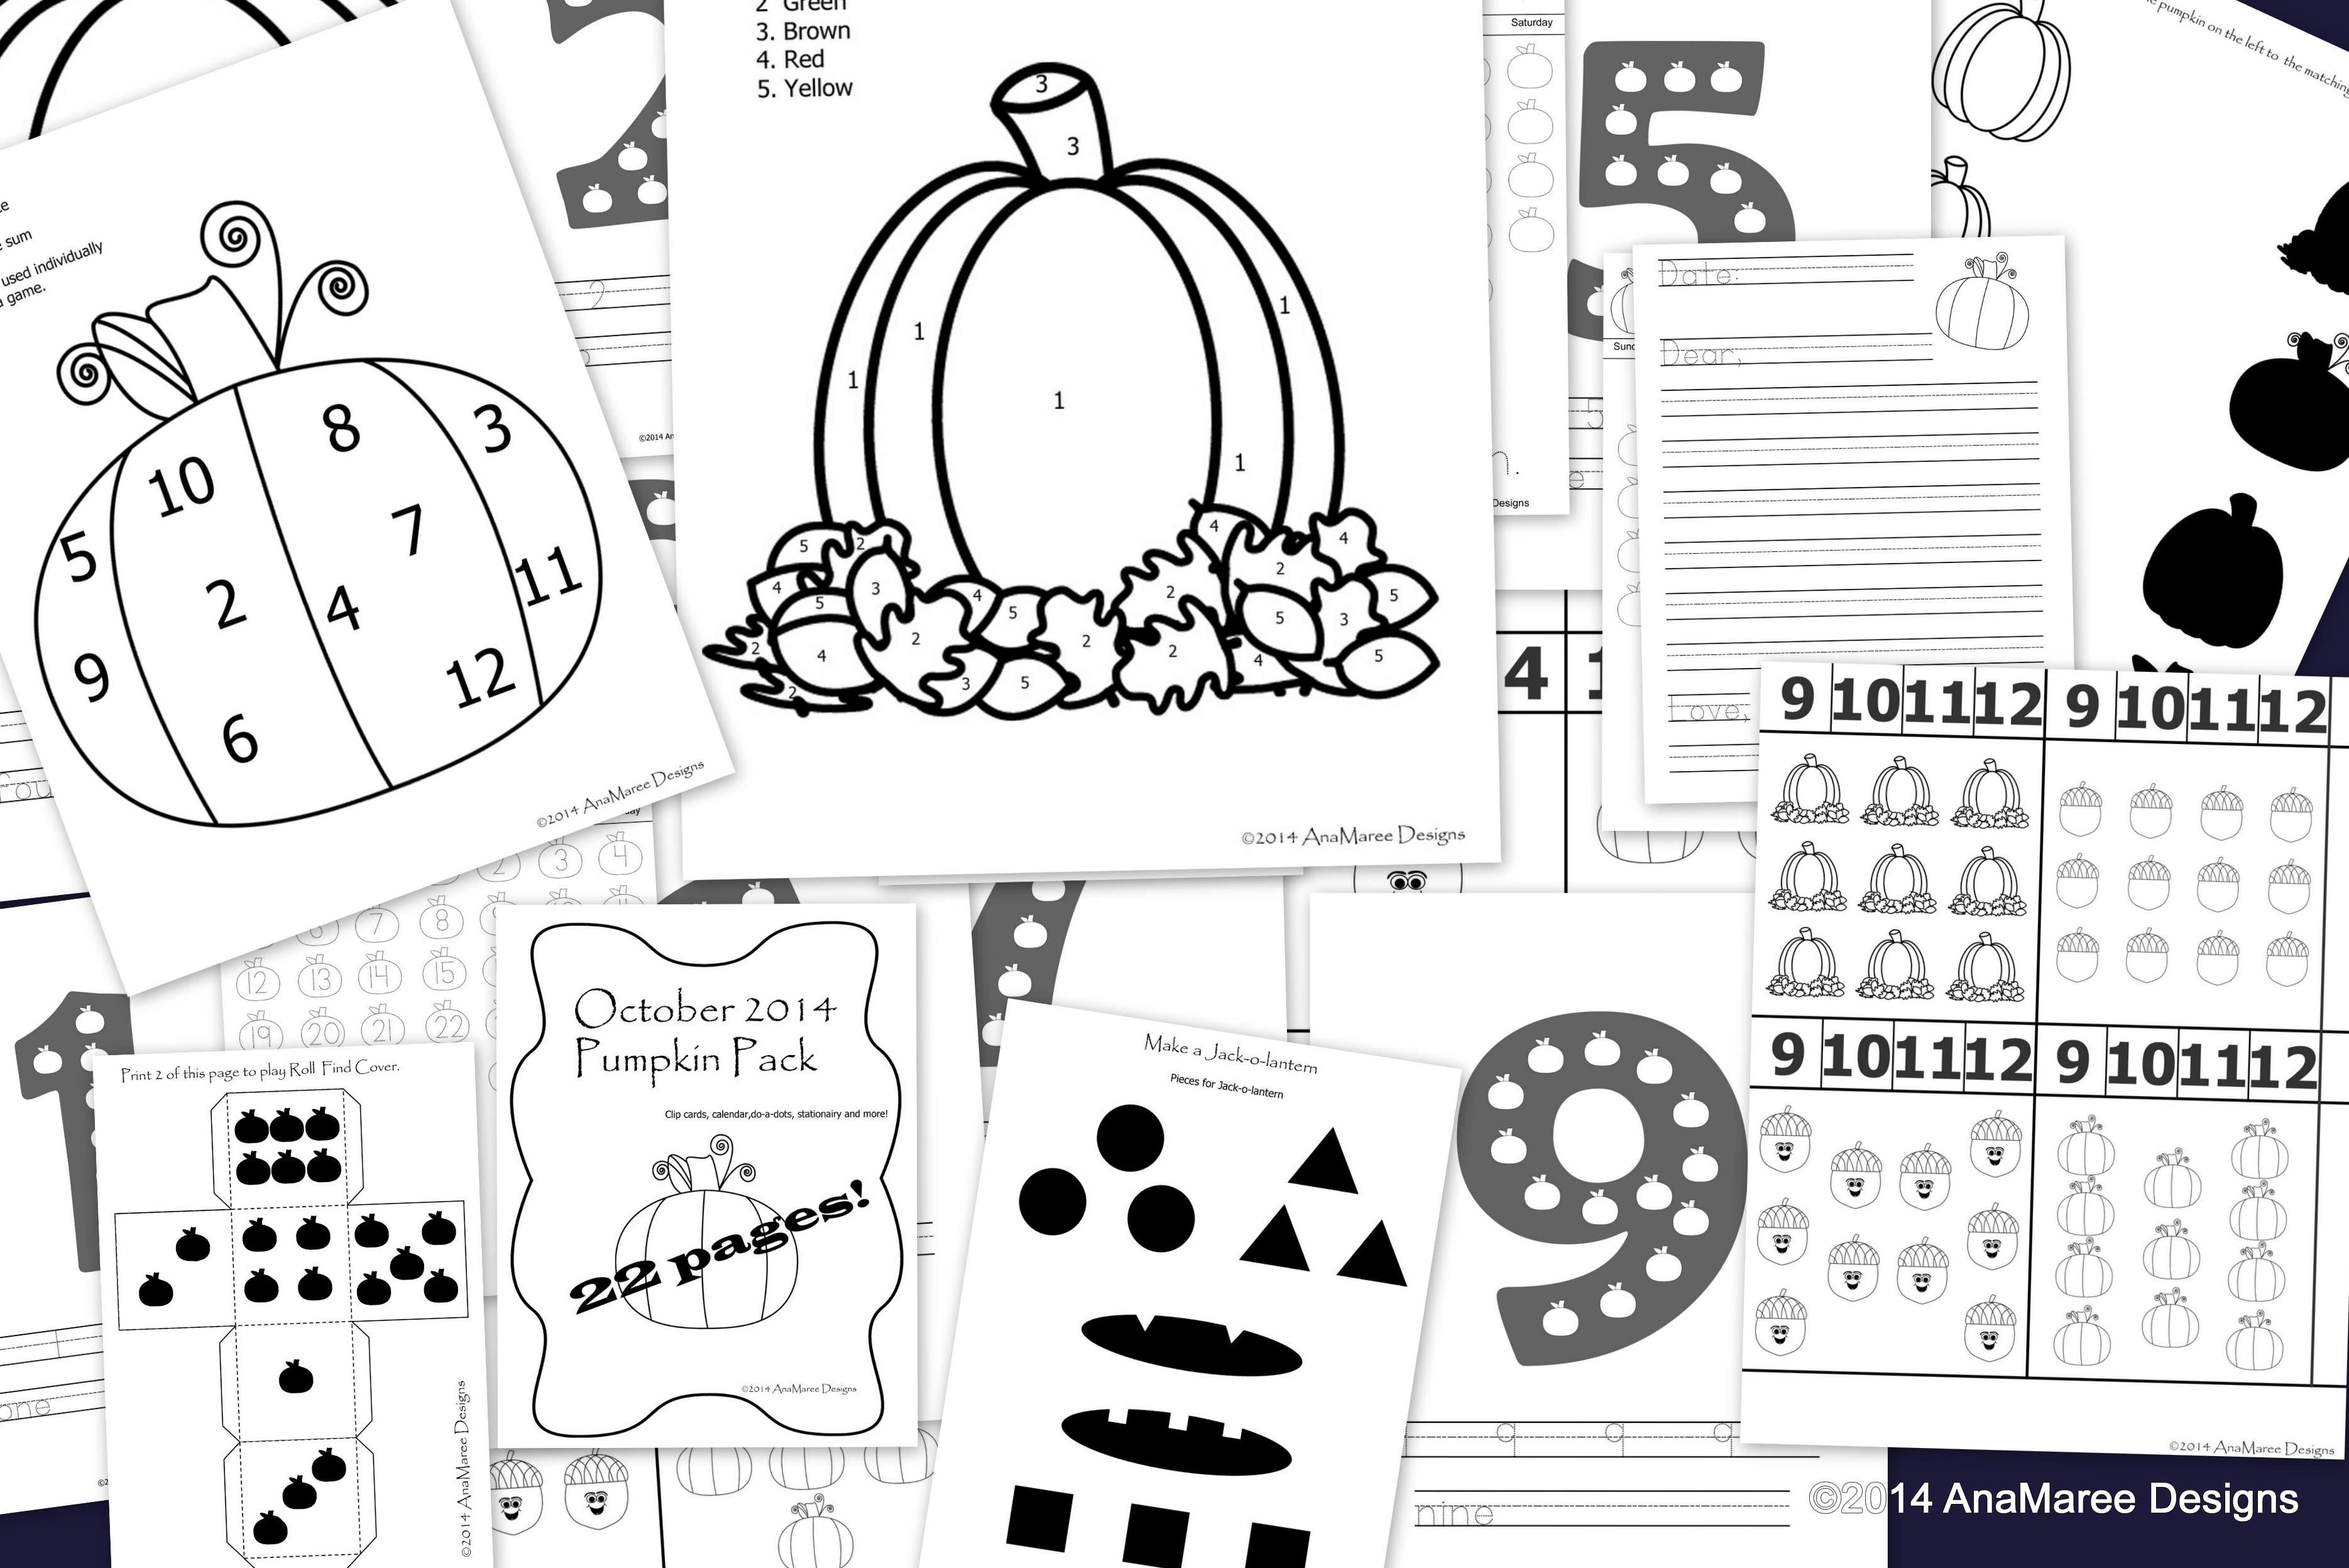 october is coming… PUMPKINS! « anamaree designs